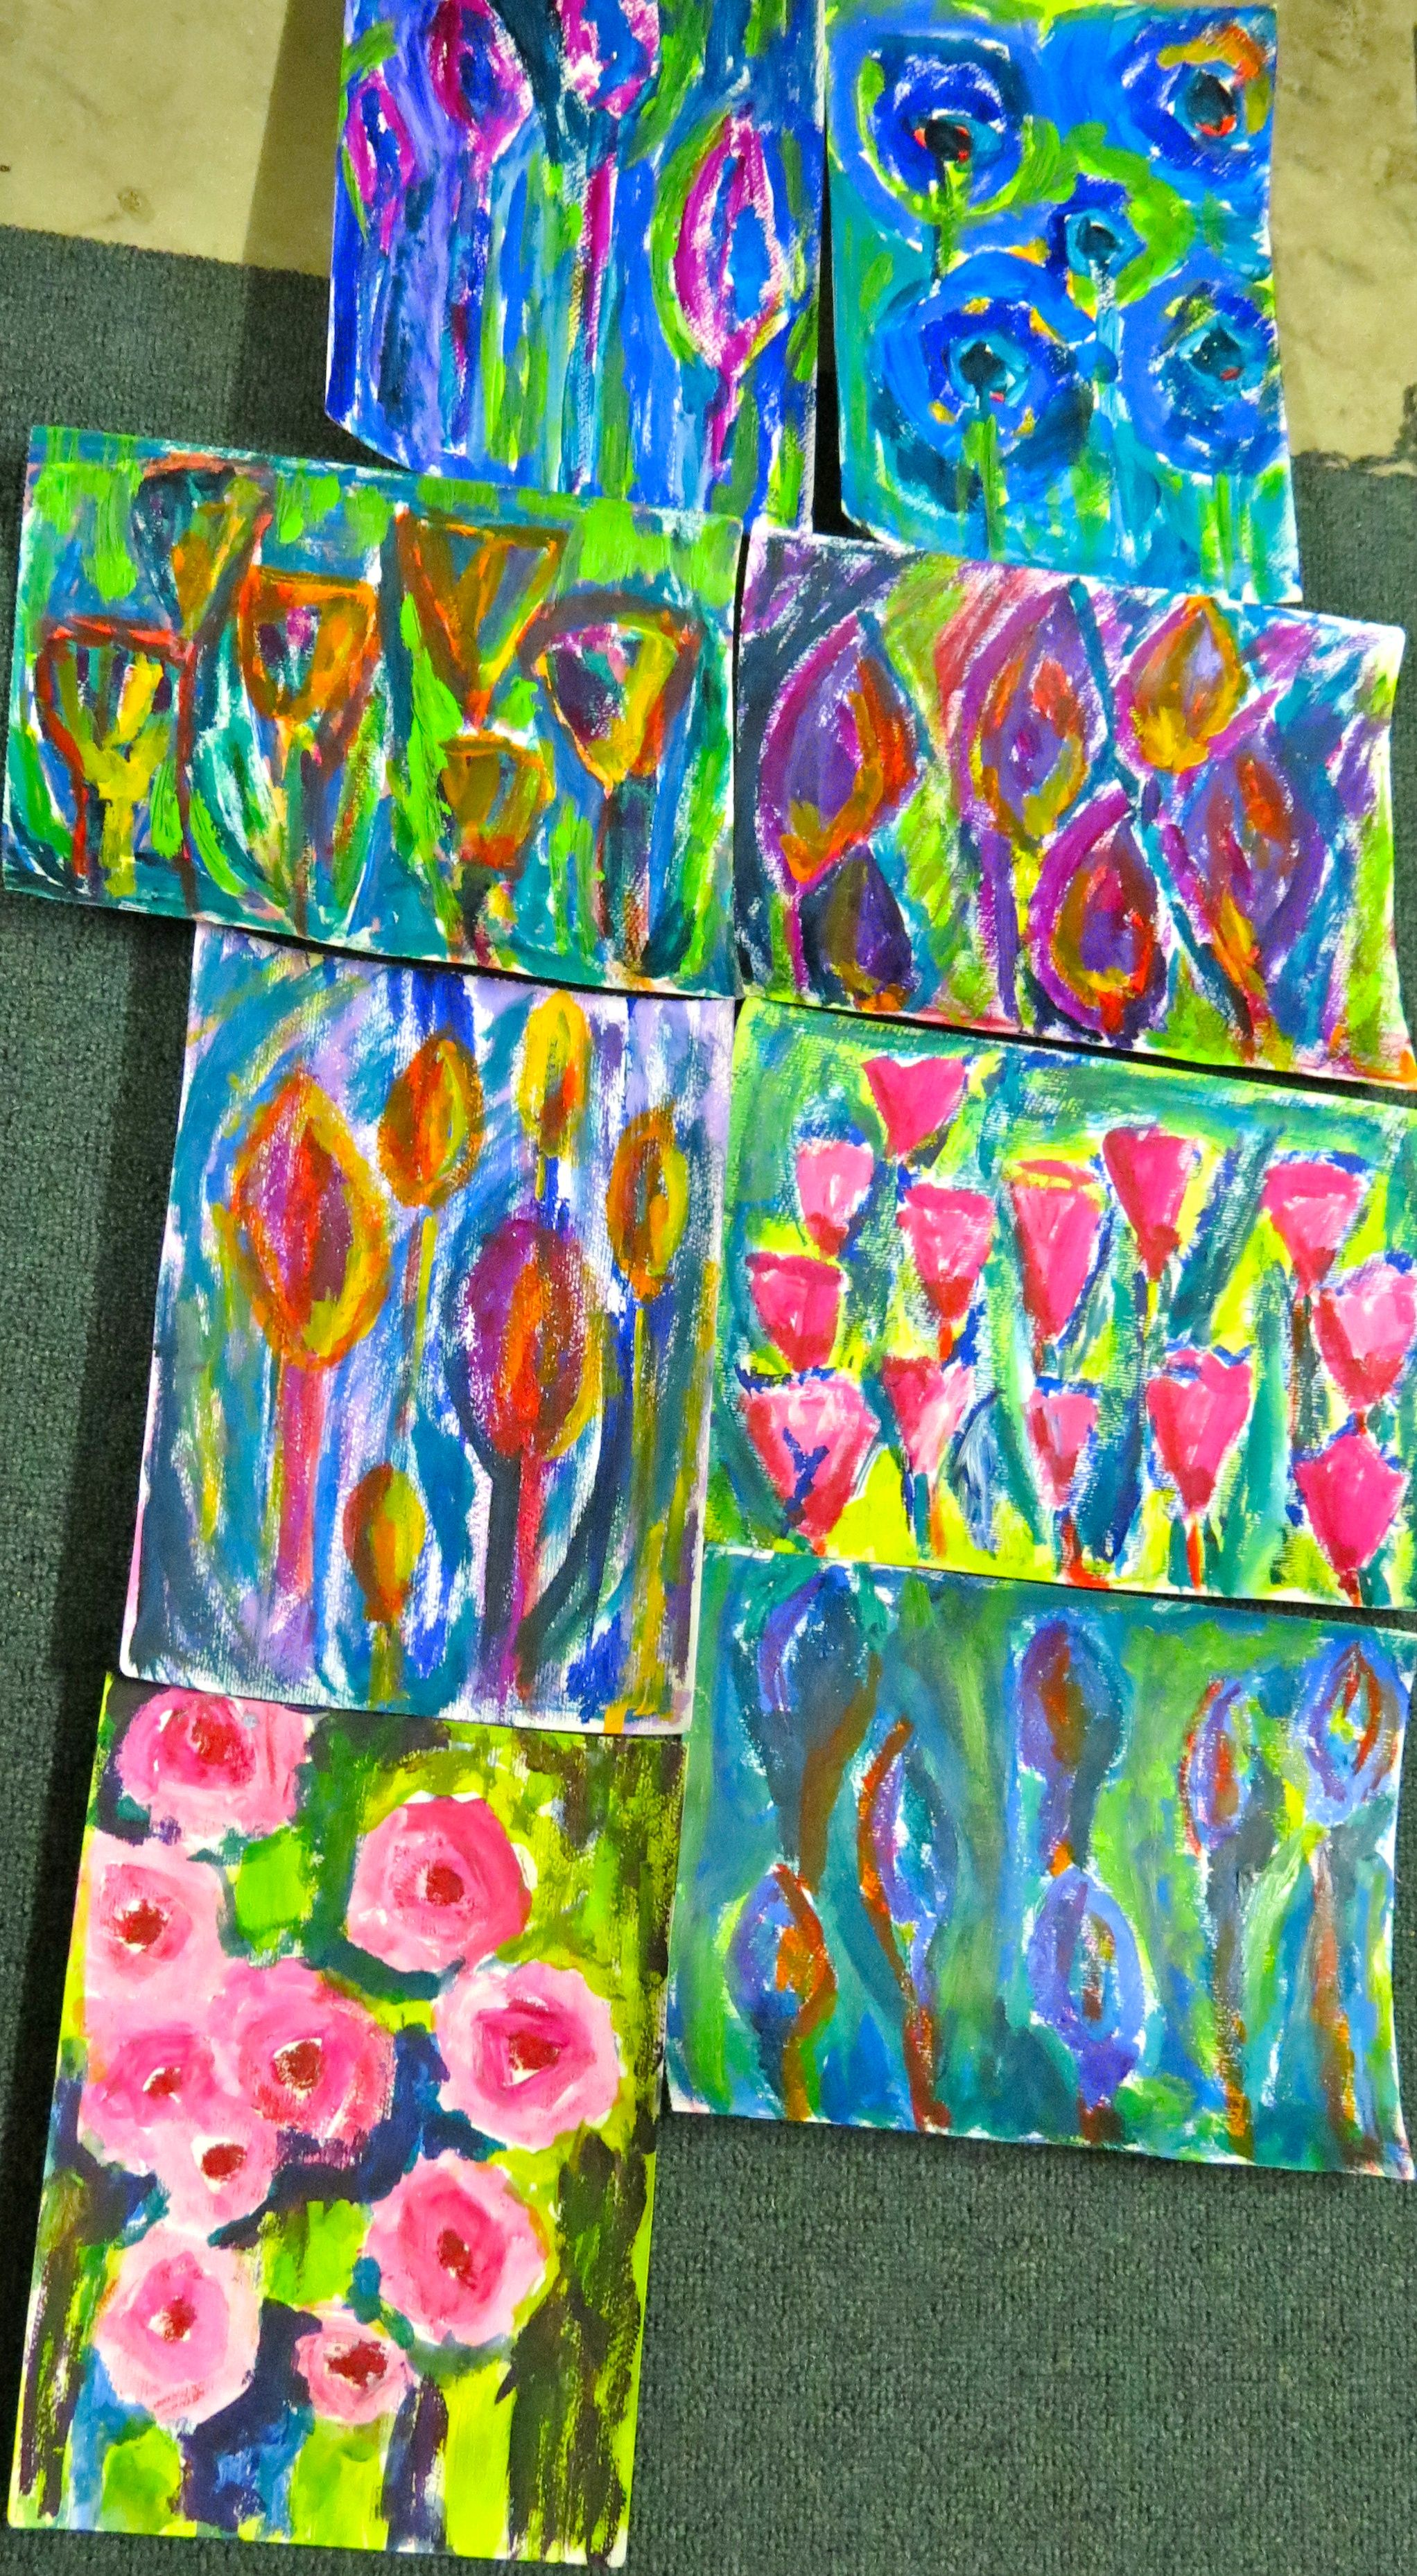 paint art by kat gottke